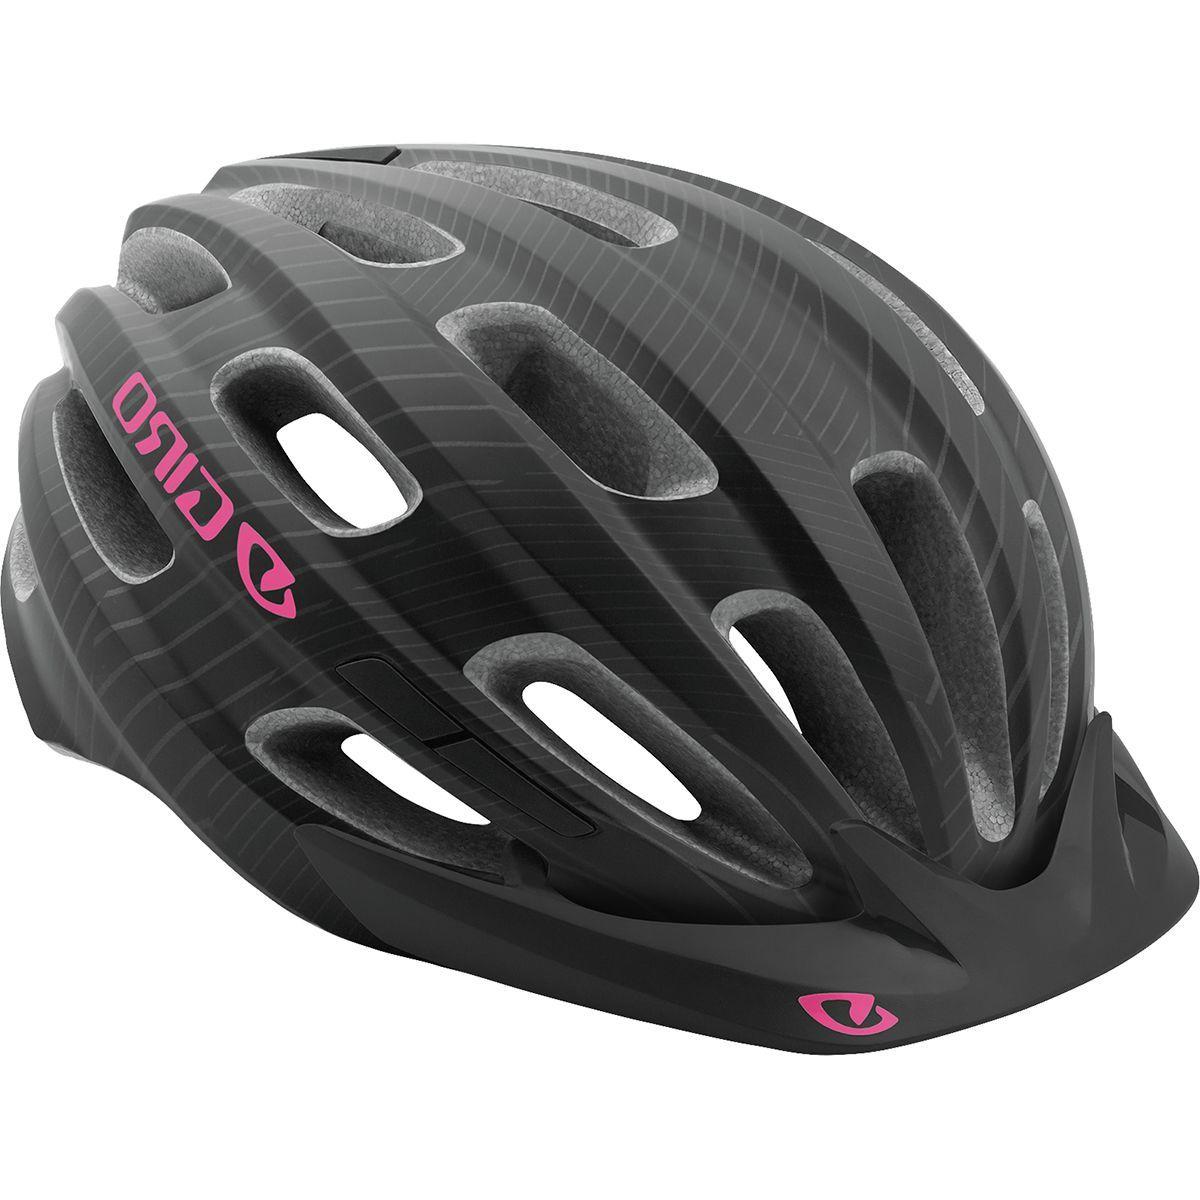 Giro Vasona MIPS Helmet - Women's